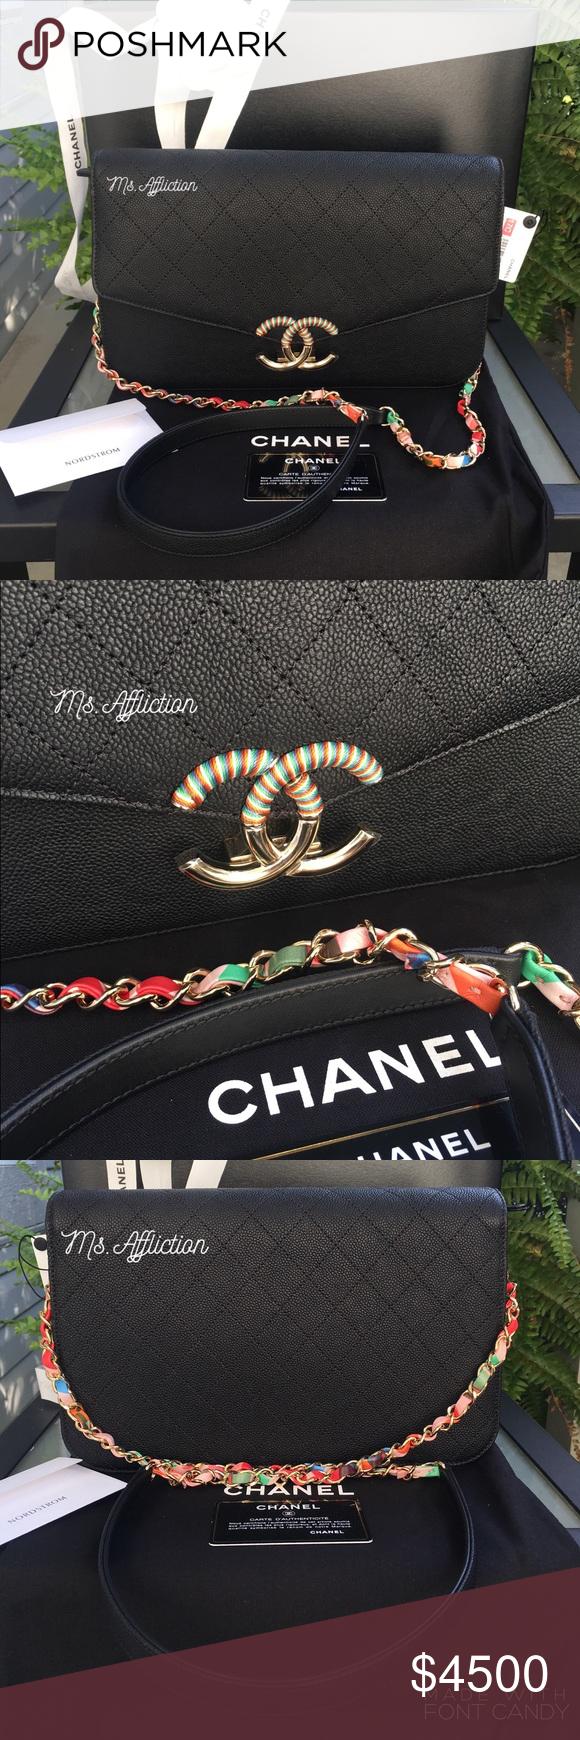 eee9743e38a6df CHANEL Pt I Authentic Caviar Flap Jumbo Cuba Bag Beautiful rigid black  caviar, multi-